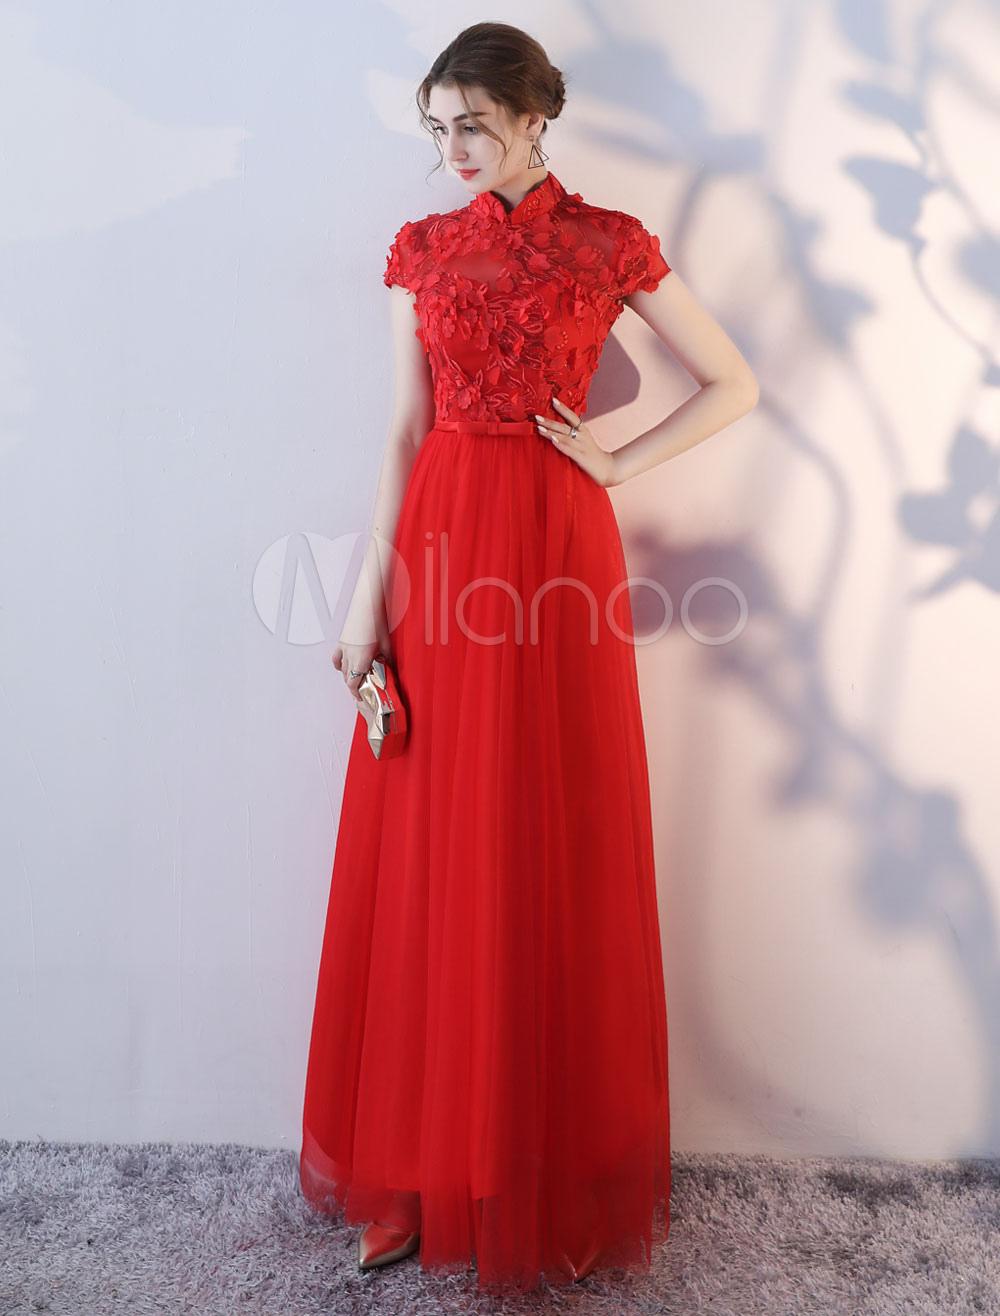 Buy Prom Dresses Long Burgundy High Collar Flowers Bow Sash Floor Length Formal Evening Dress for $87.99 in Milanoo store